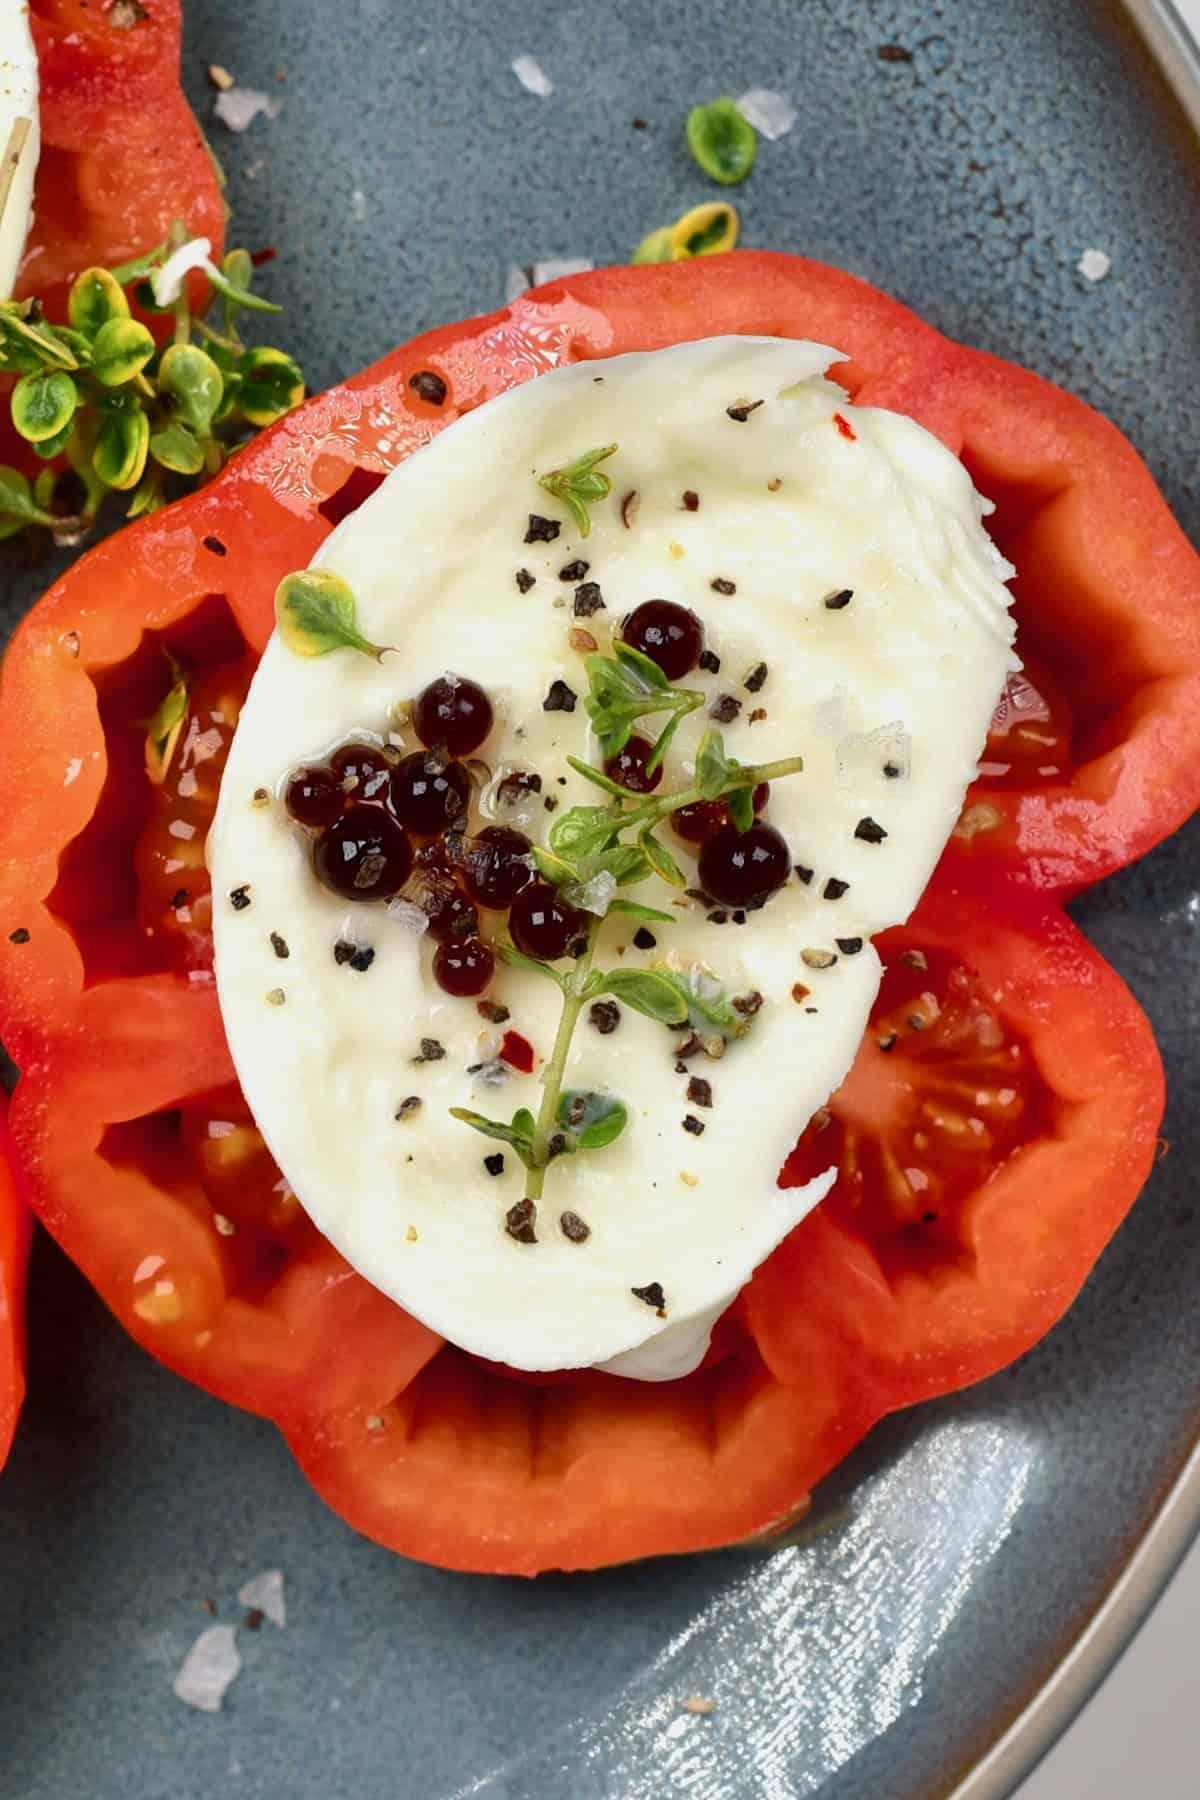 Balsamic vinegar over tomato mozzarela salad